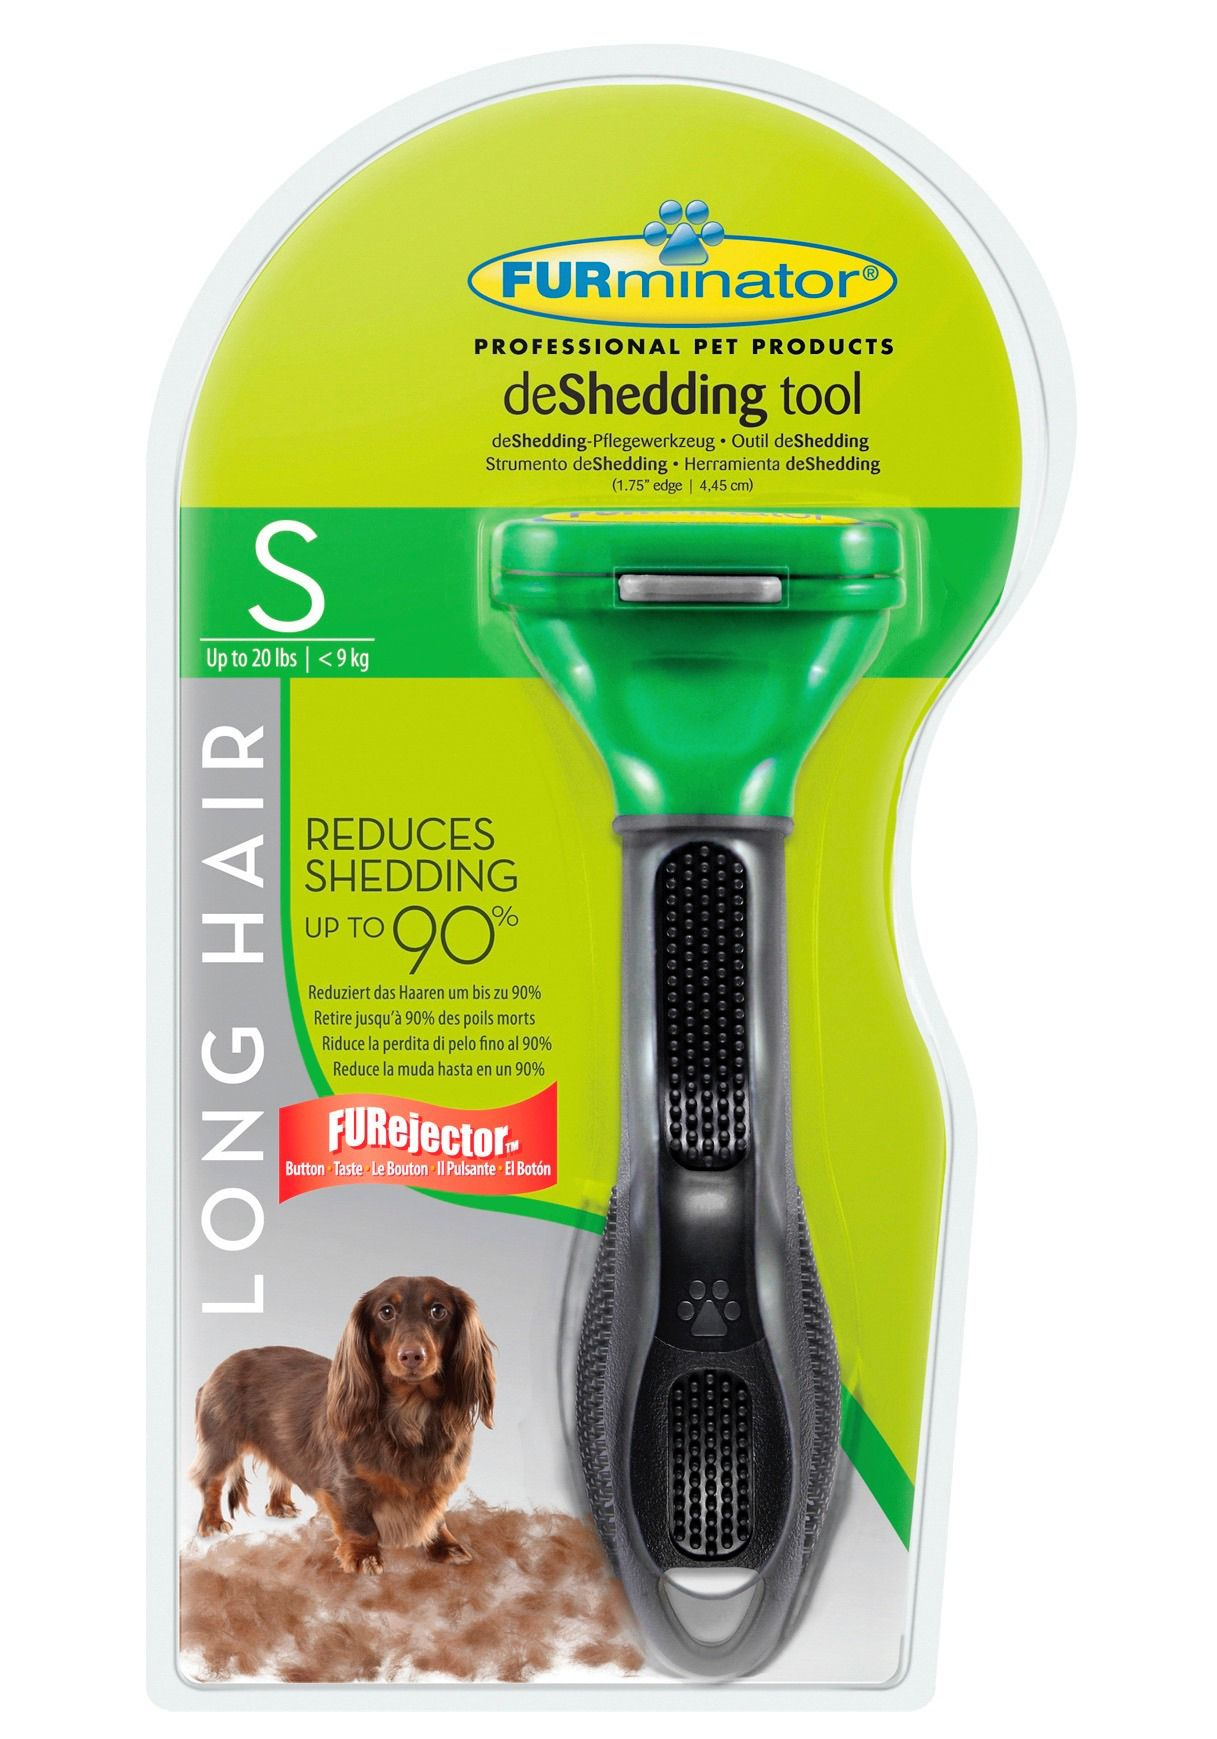 FURMINATOR Hundepflegebürste »FURminator - deShedding Long Hair S« 4,5-9 kg